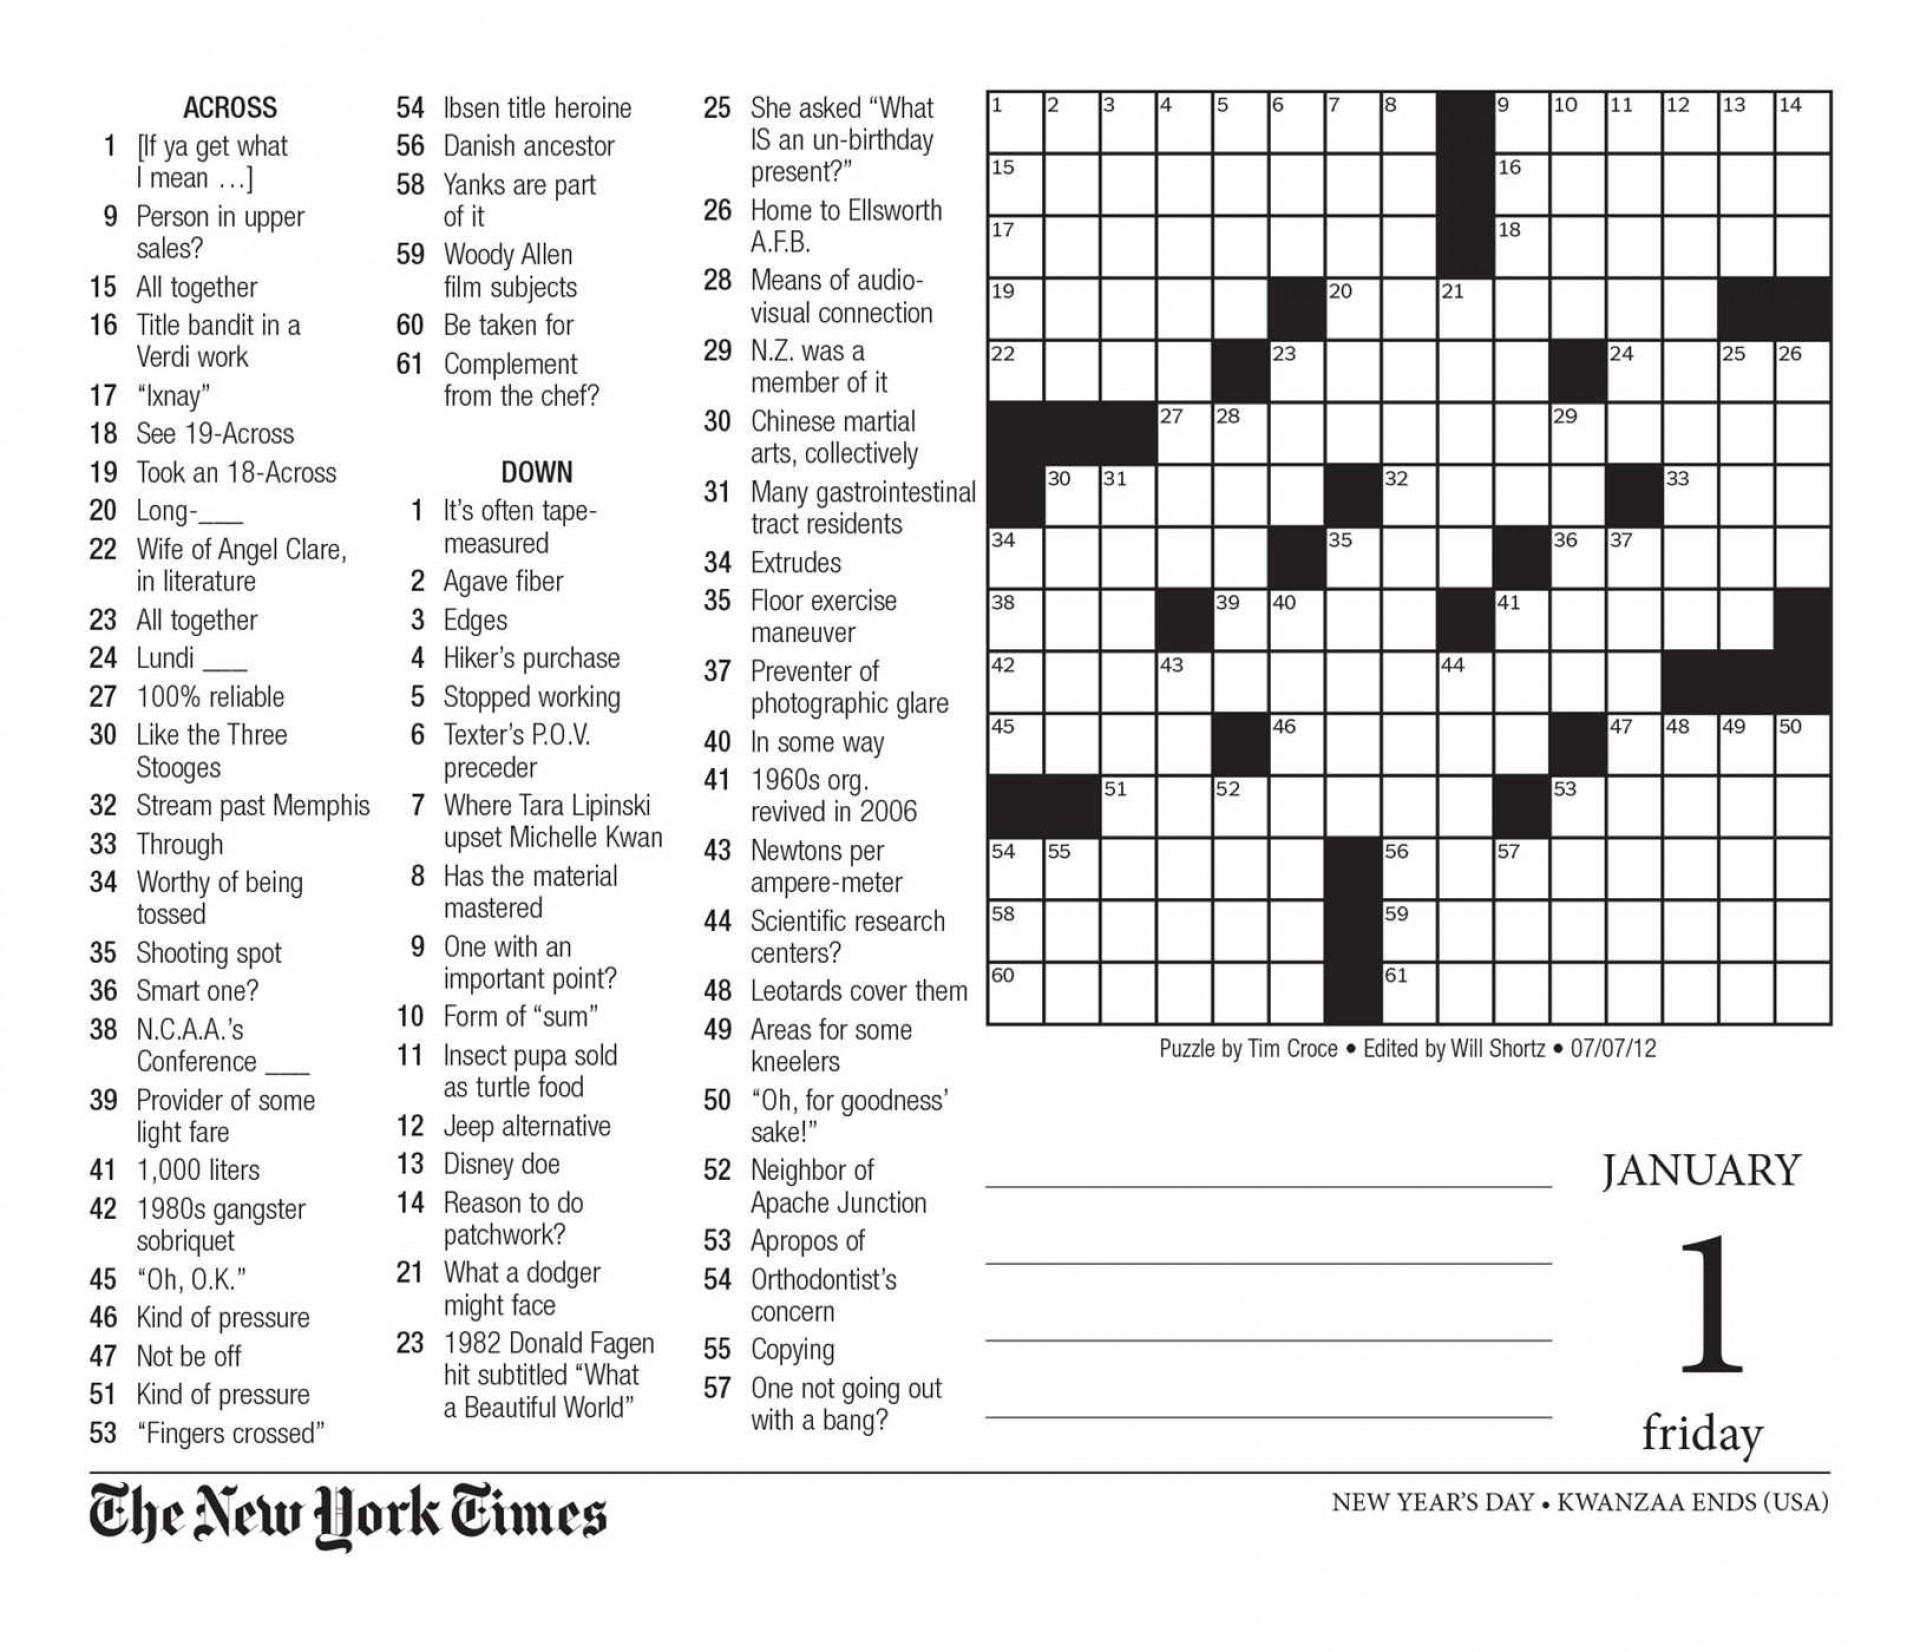 Free Printable Large Print Crossword Puzzles | M3U8 - Free Printable - Large Print Crossword Puzzles Printable